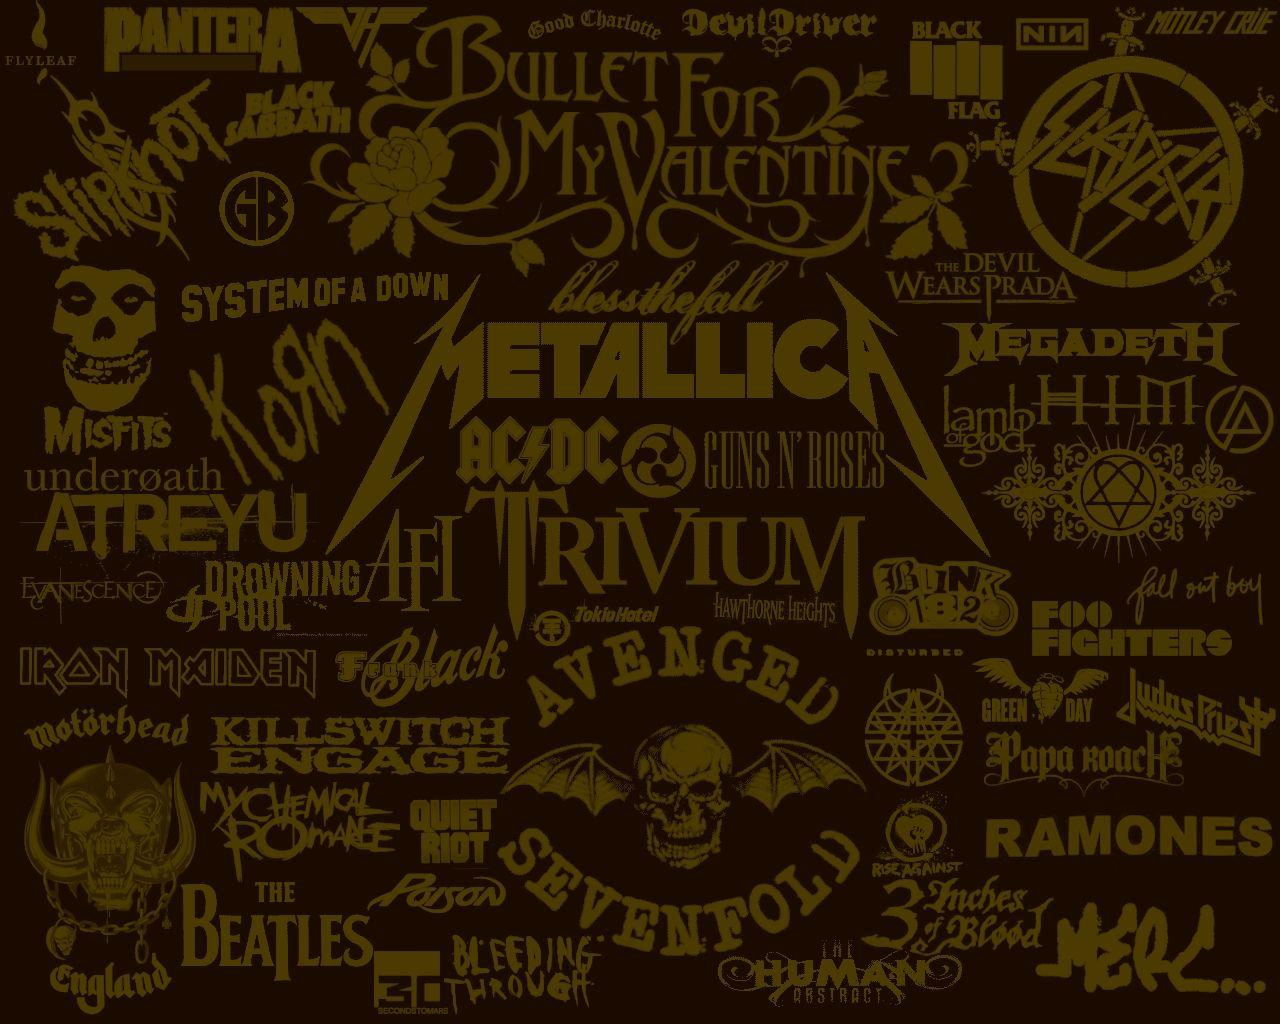 http://3.bp.blogspot.com/-dXeRSXIC_3Y/UPdxgnDFWFI/AAAAAAAACv0/1_UX7EUuiIY/s1600/wallpaper-logos-bandas-de-rock-4486.jpg